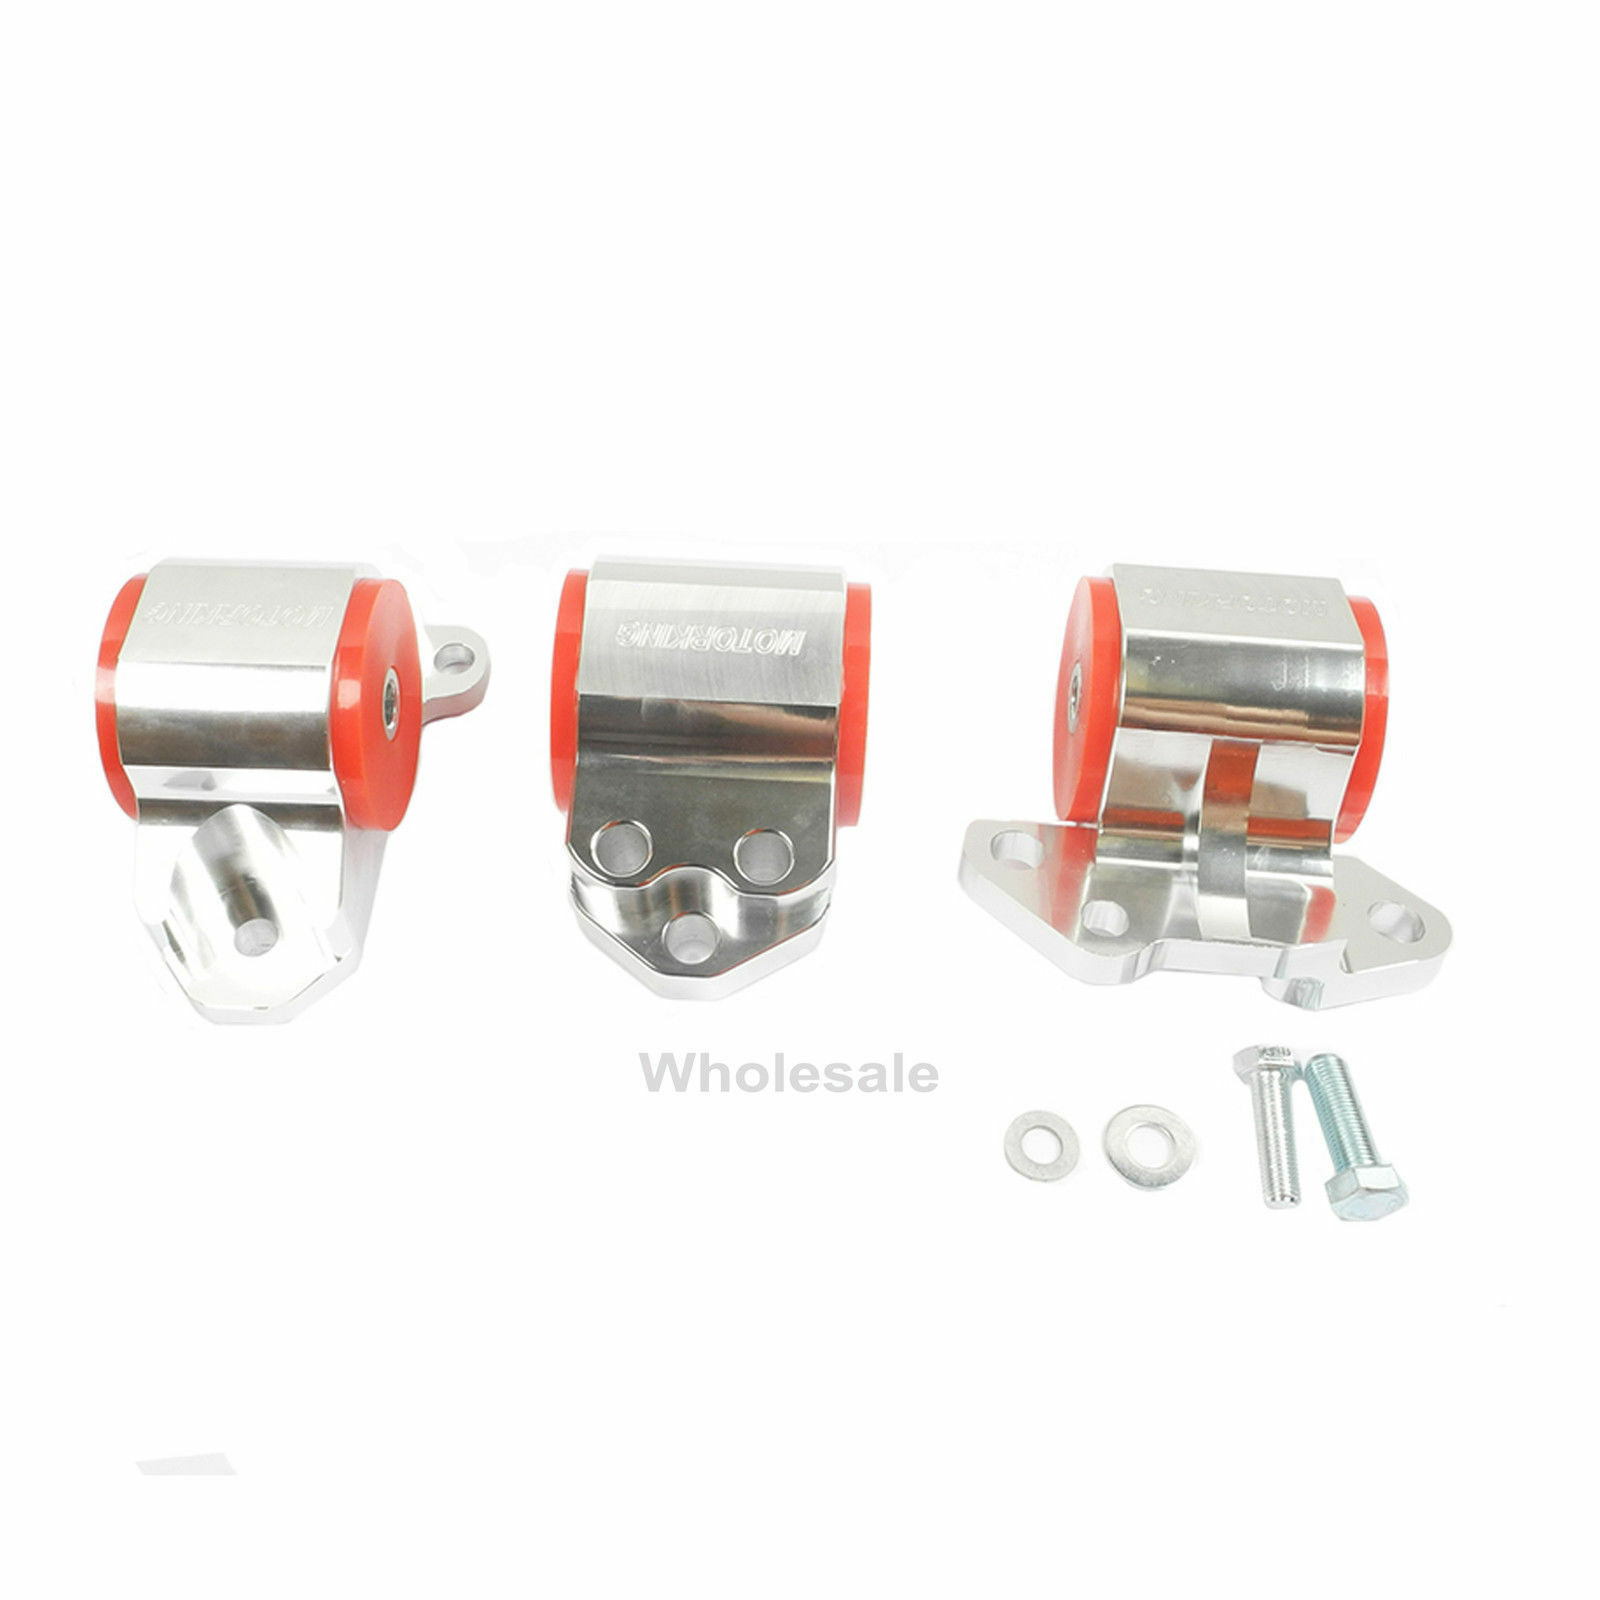 M1002 Swap Motor Mount 3 Bolt For 92-95 Honda Civic Del Sol 94-01 Acura B Series